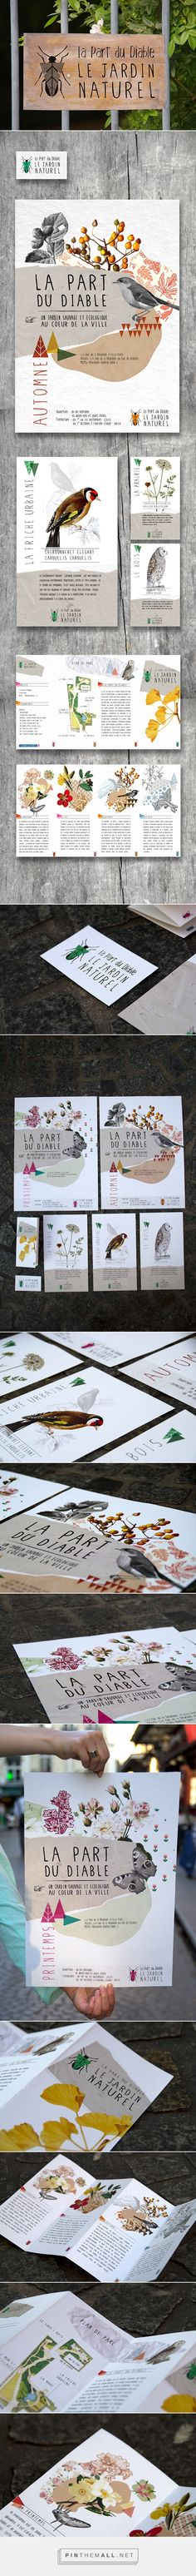 Natural Garden, Paris on Behance | Fivestar Branding – Design and Branding Agency & Inspiration Gallery